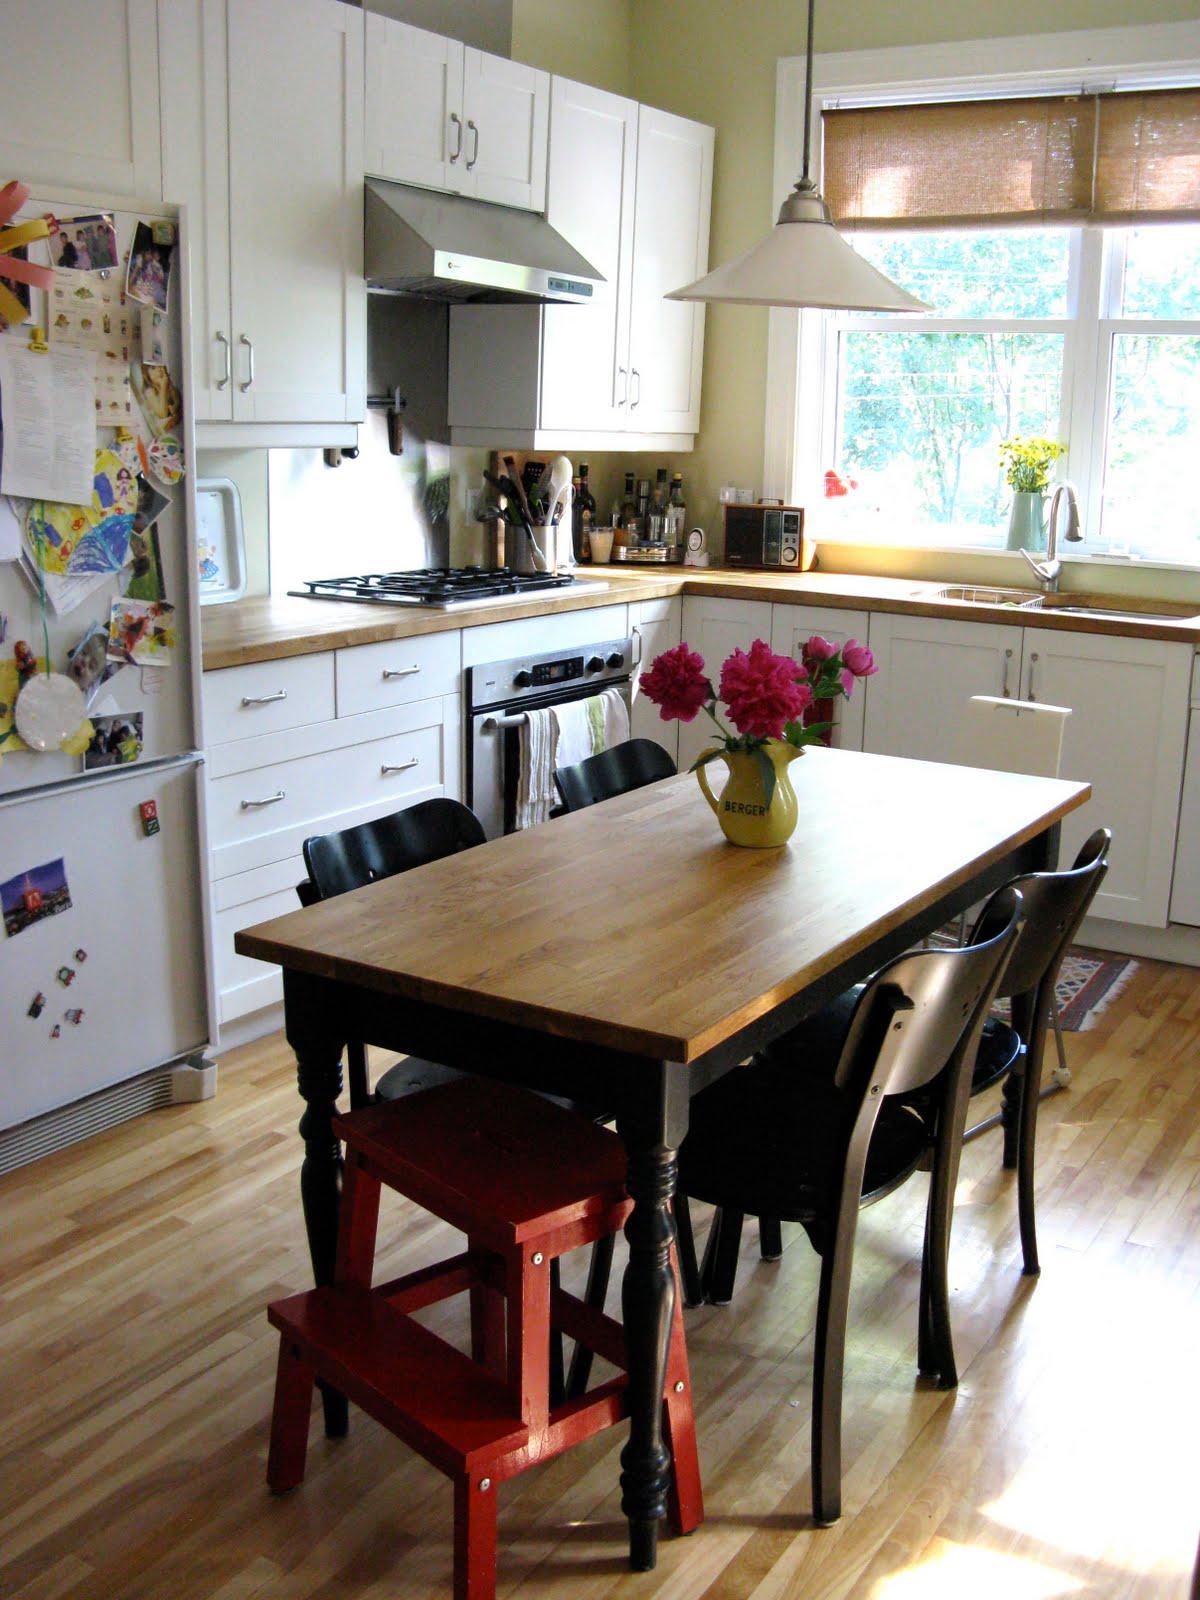 pour toujours: The kitchen and office corner, La cuisine ...